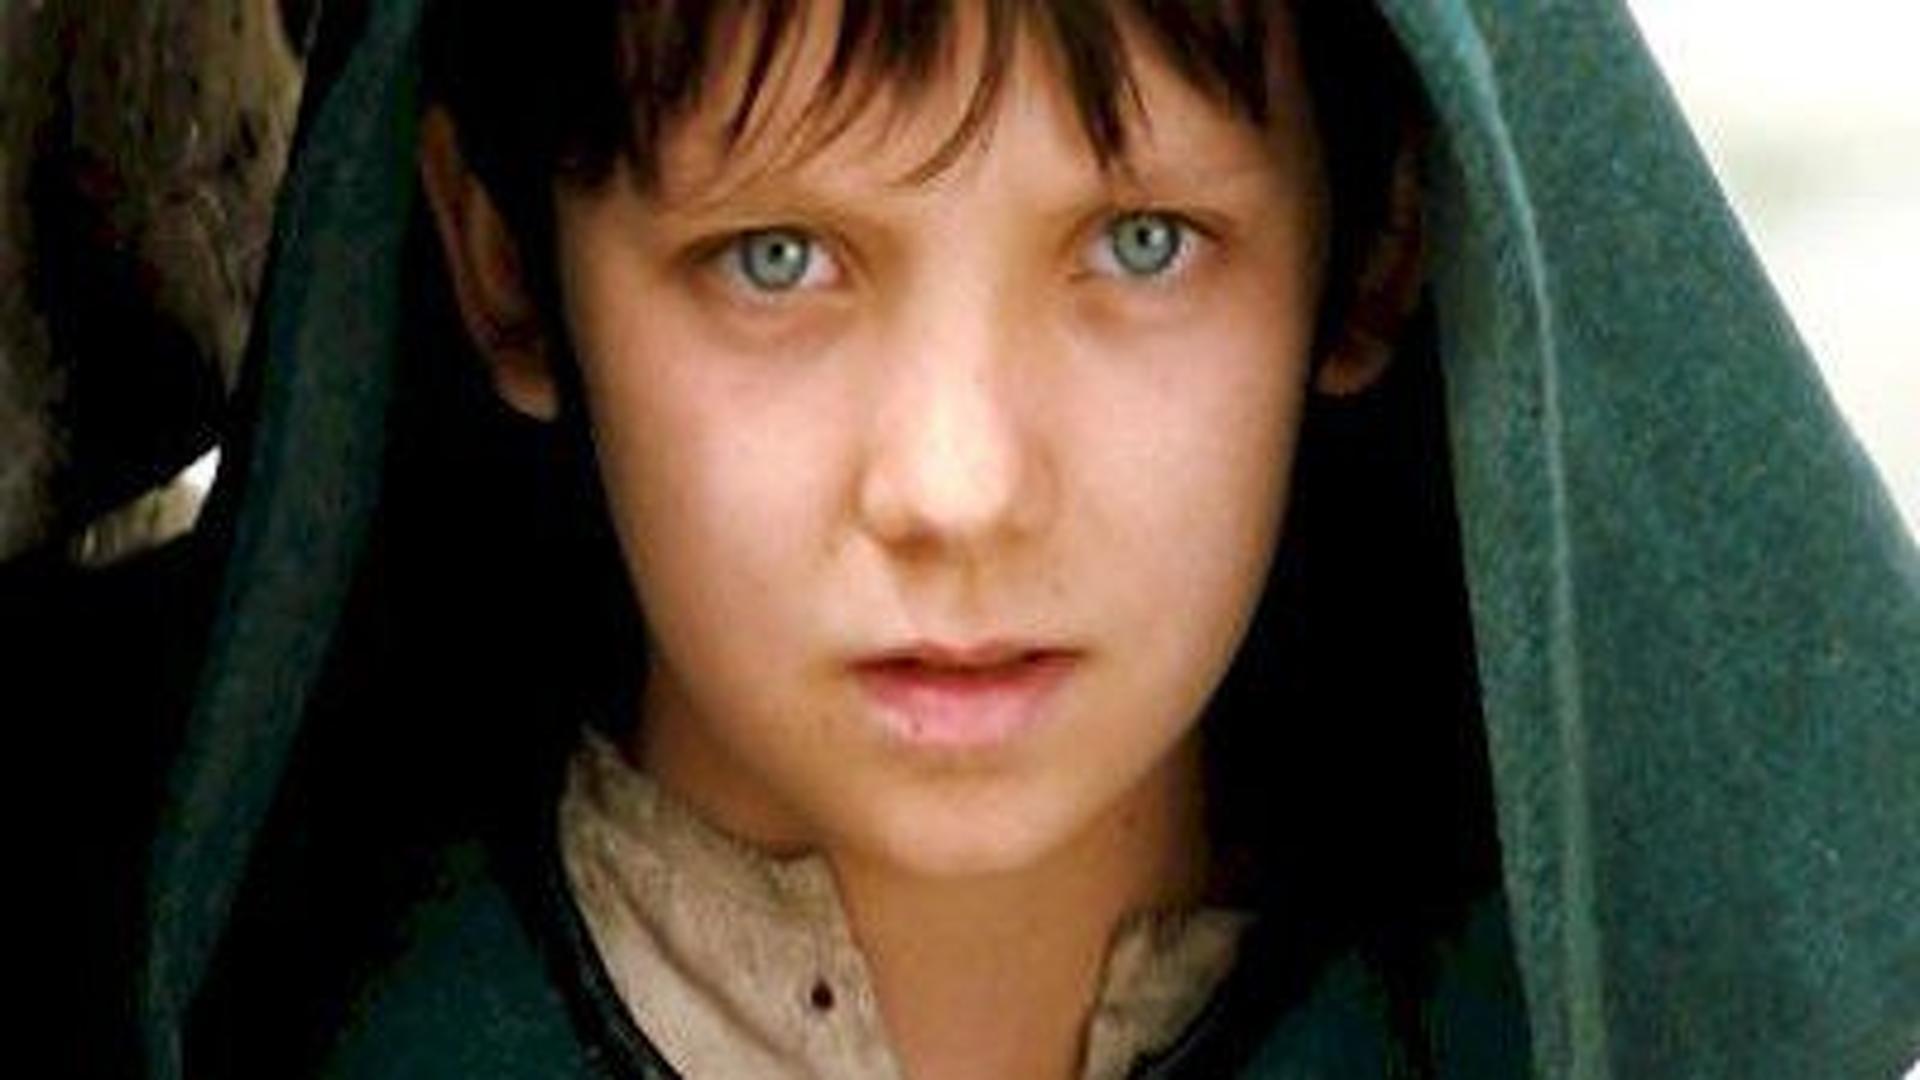 Merlin season 1 episode 7 2008 - Merlin Season 2 Episode 10 2008 S01e7 The Gates Of Avalon Merlin